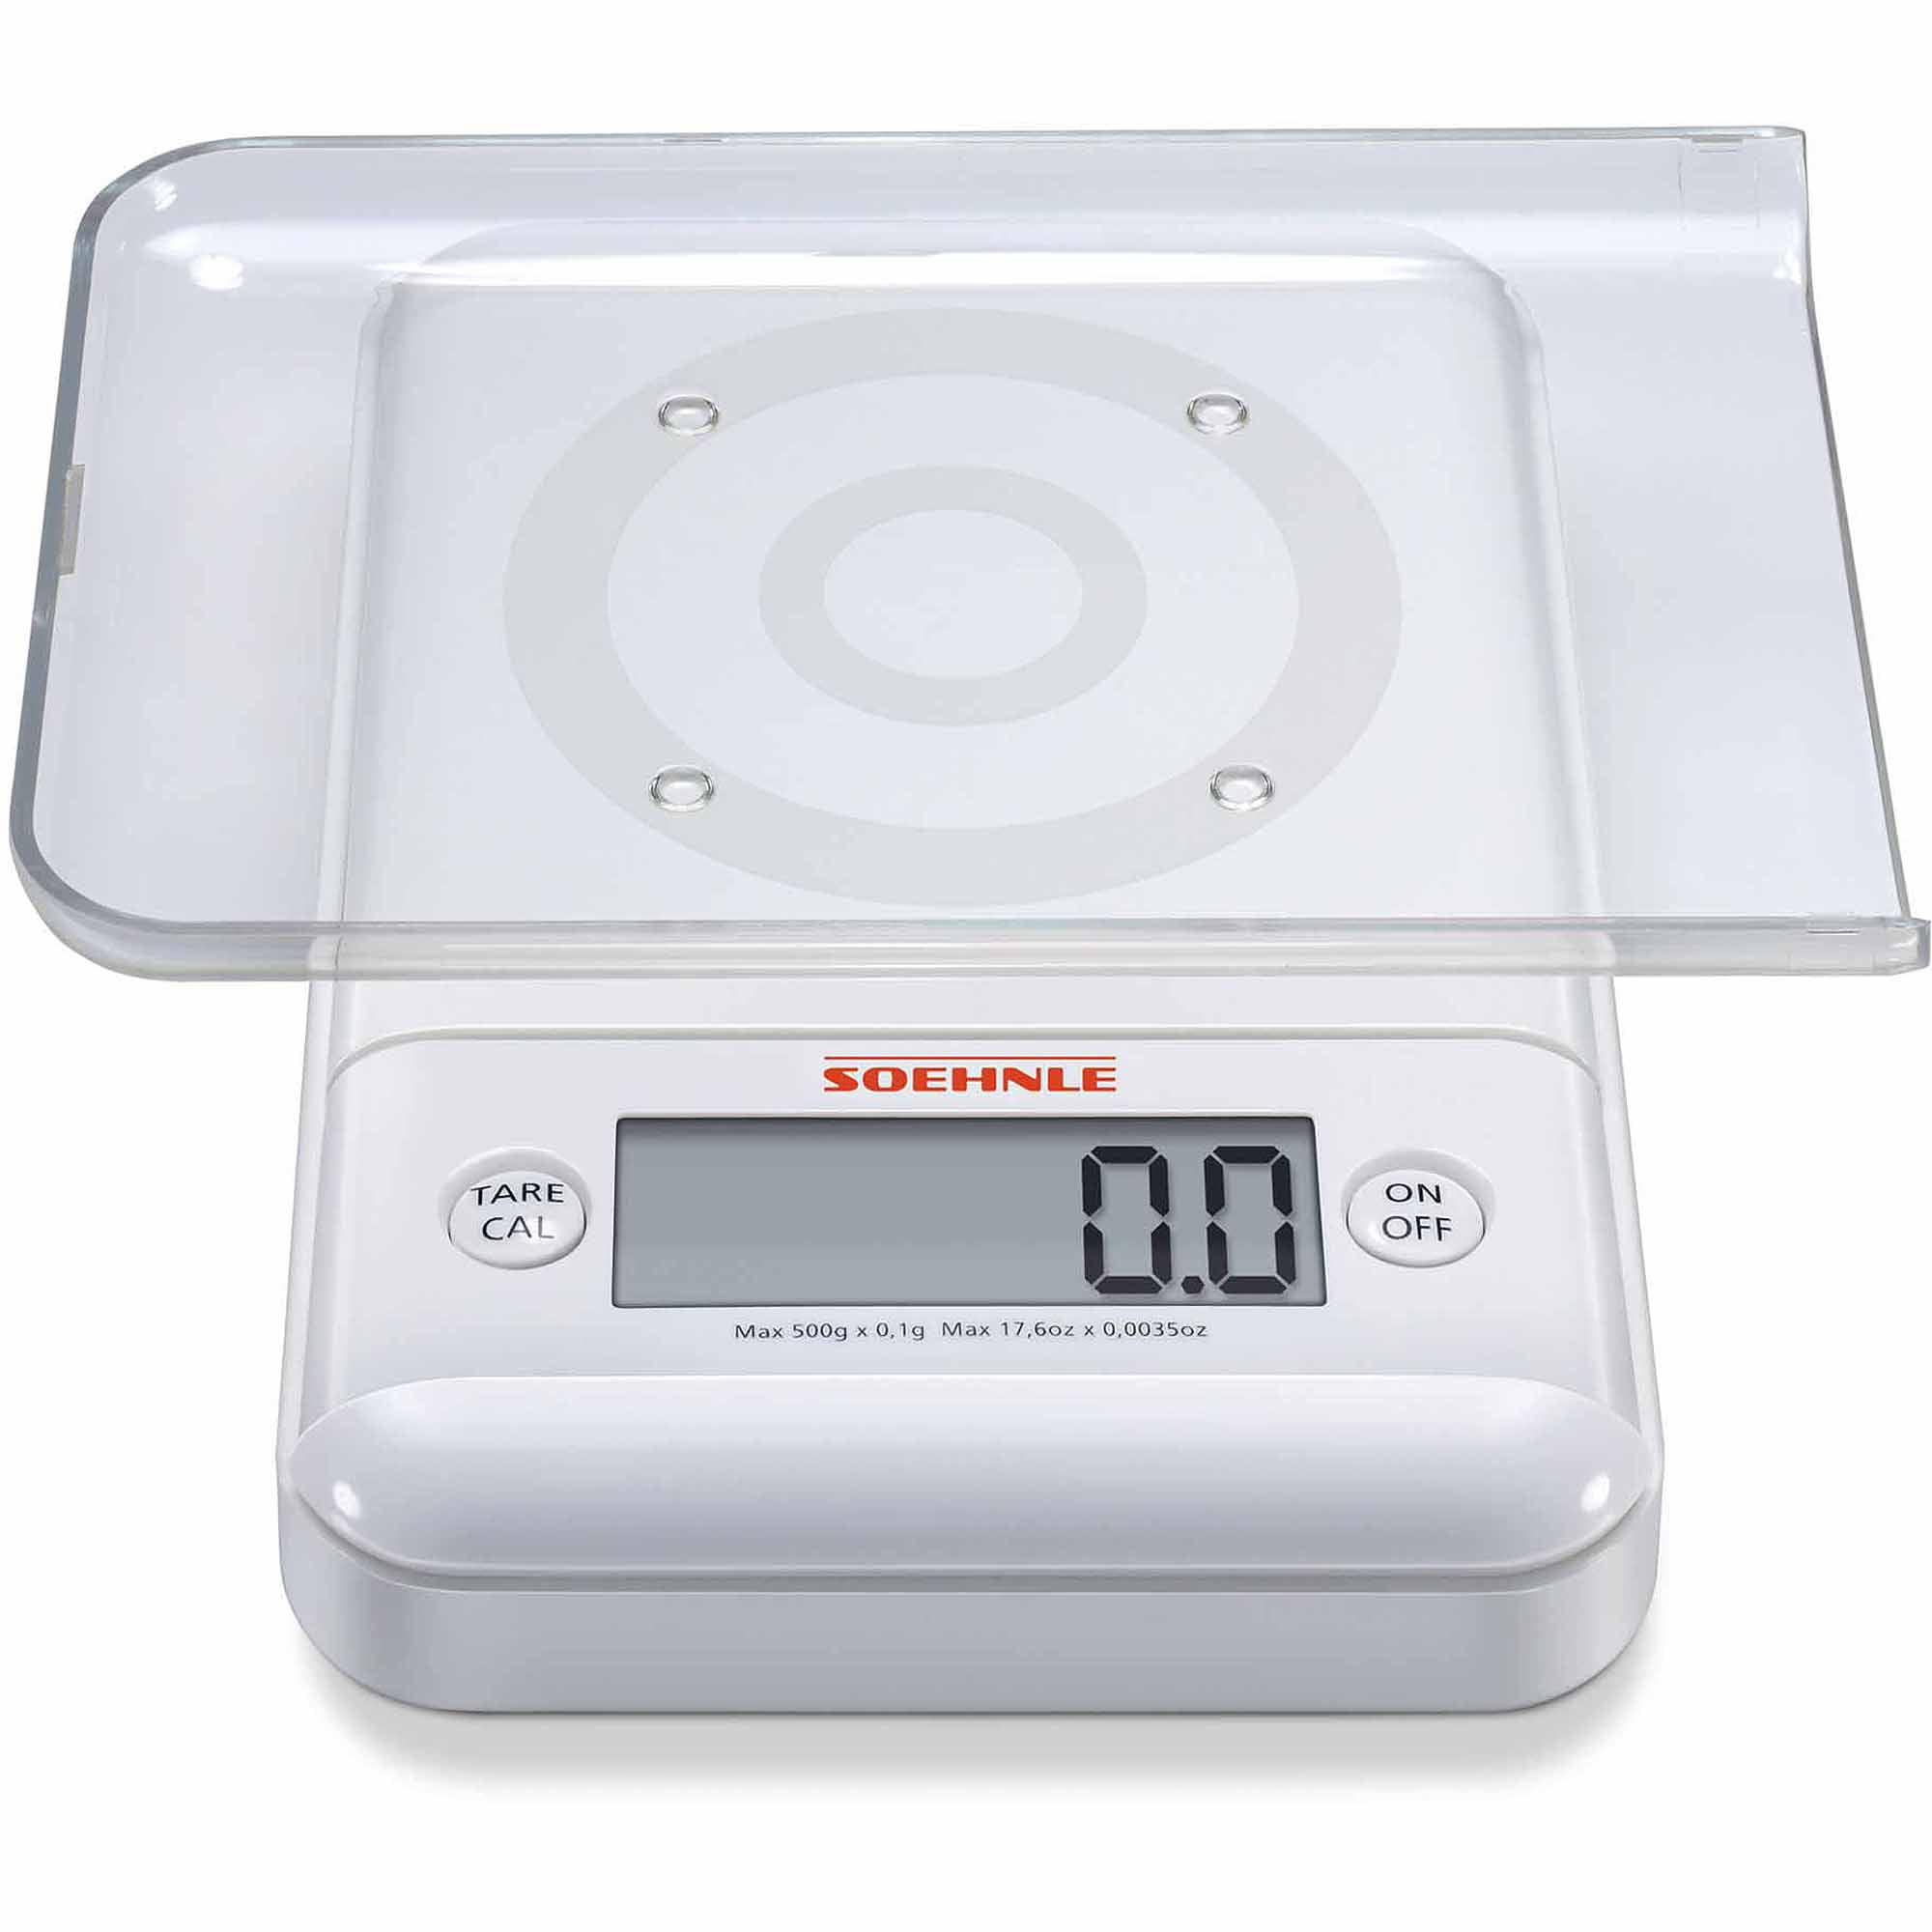 Soehnle ULTRA 2.0 Precision Digital Food Scale, 17.6 Oz, White   Walmart.com